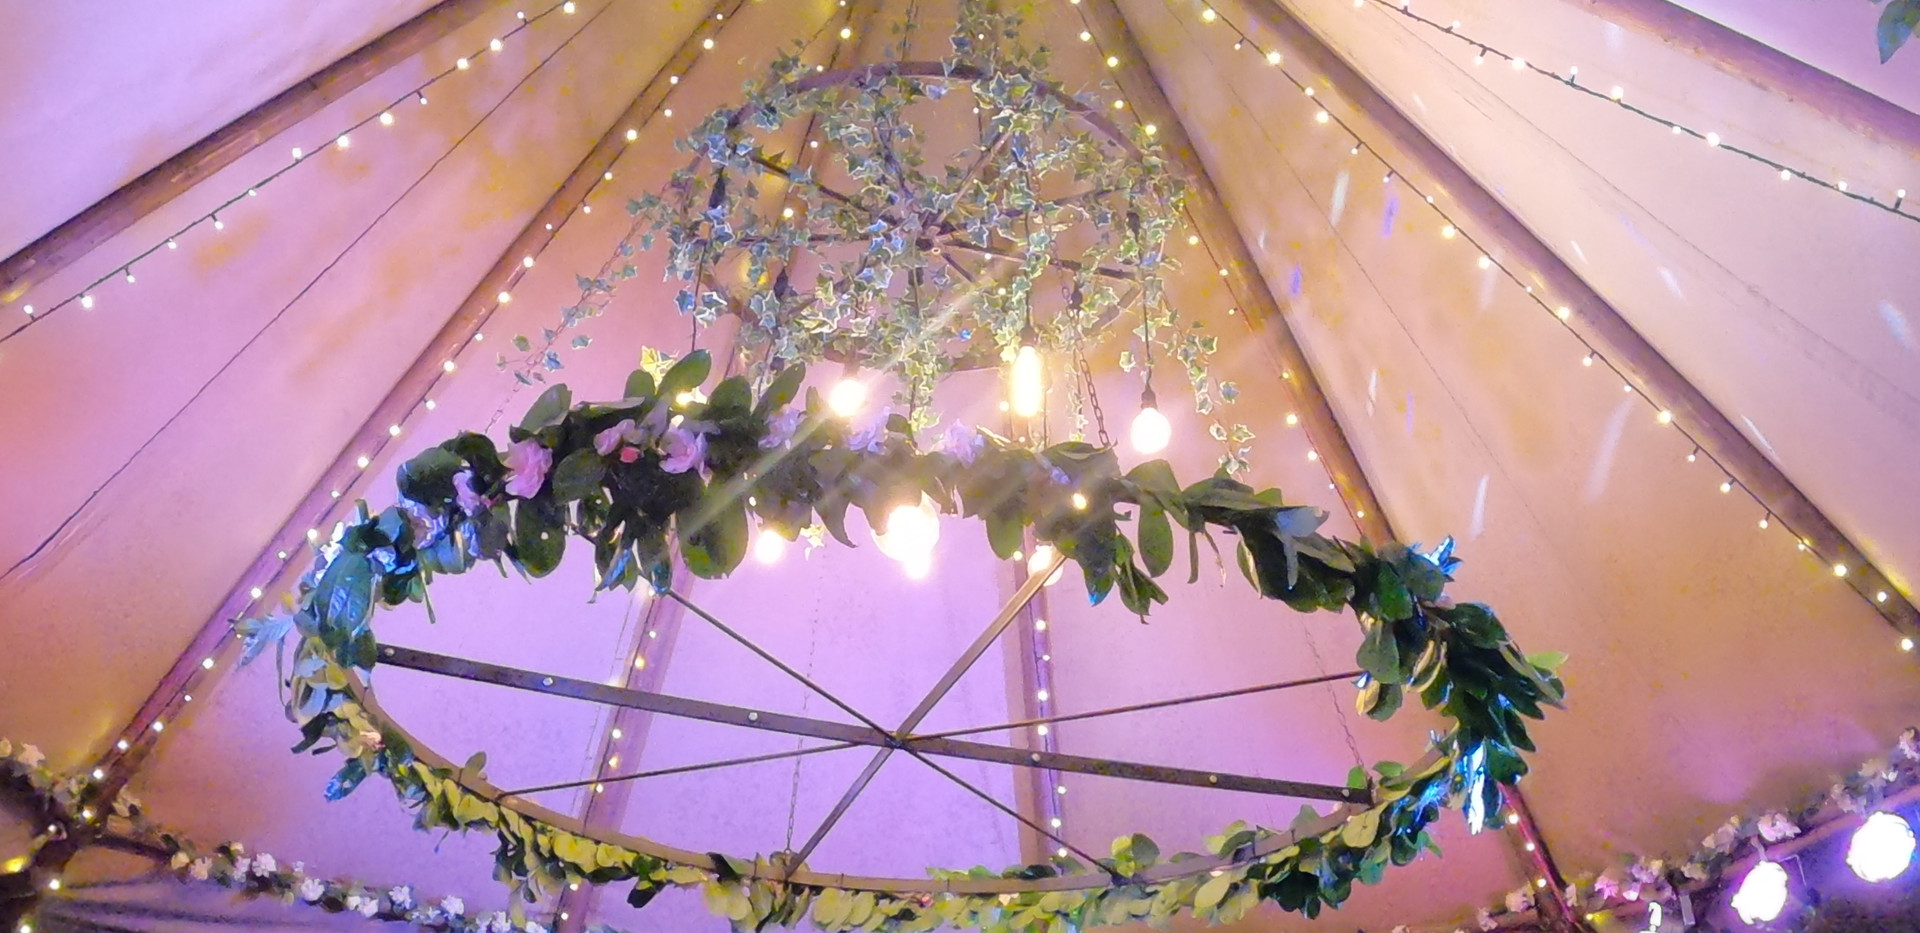 Tipi Chandelier and Flower Wheel